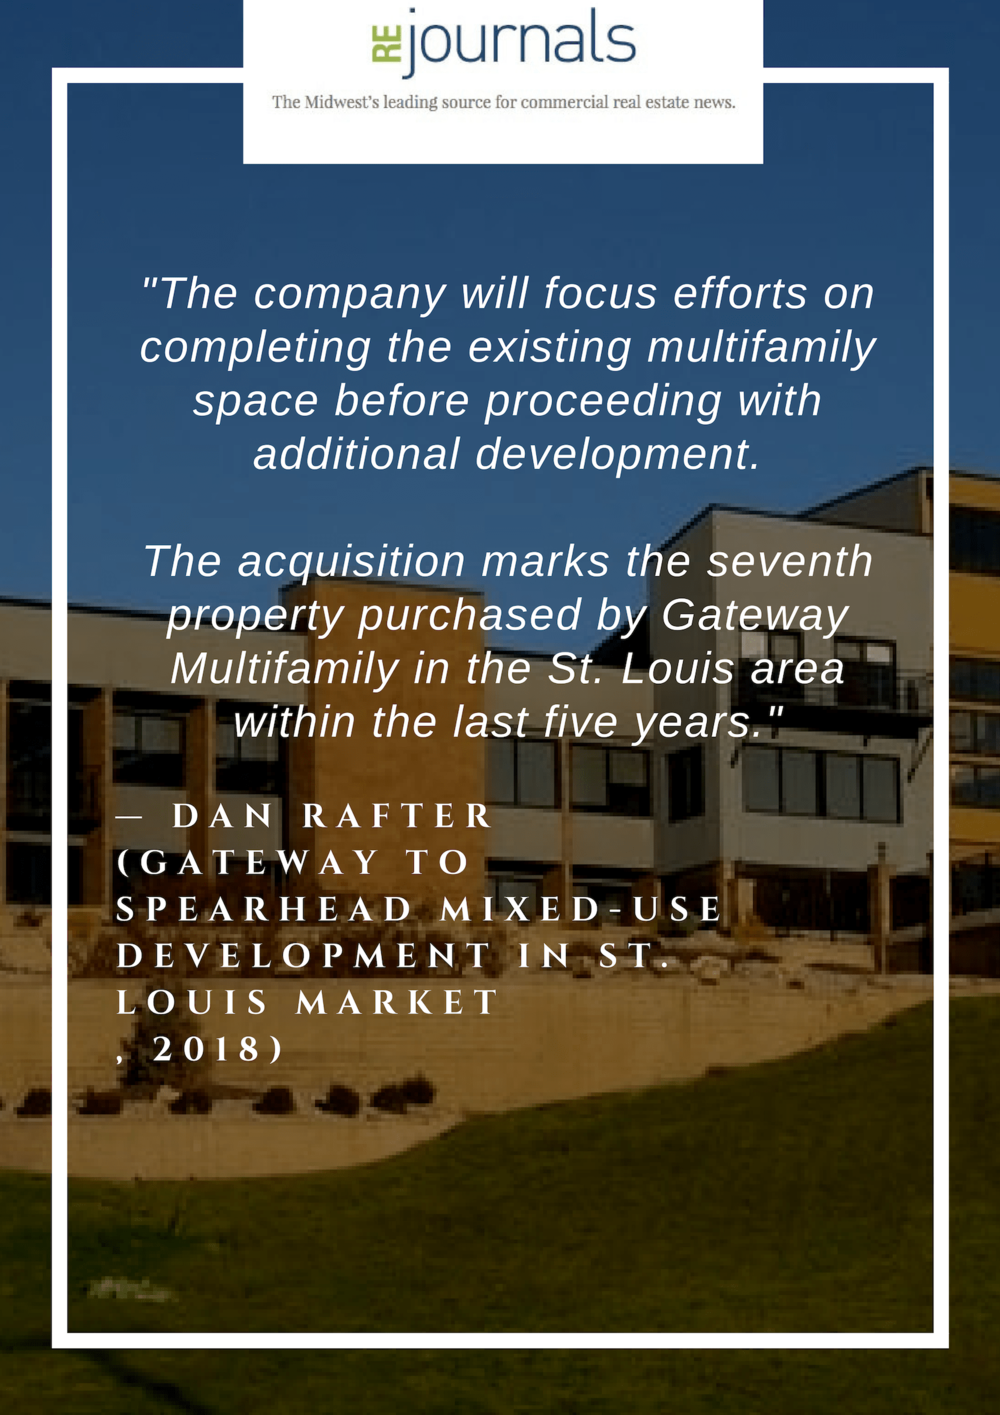 Gateway to spearhead mixed-use development in St. Louis market